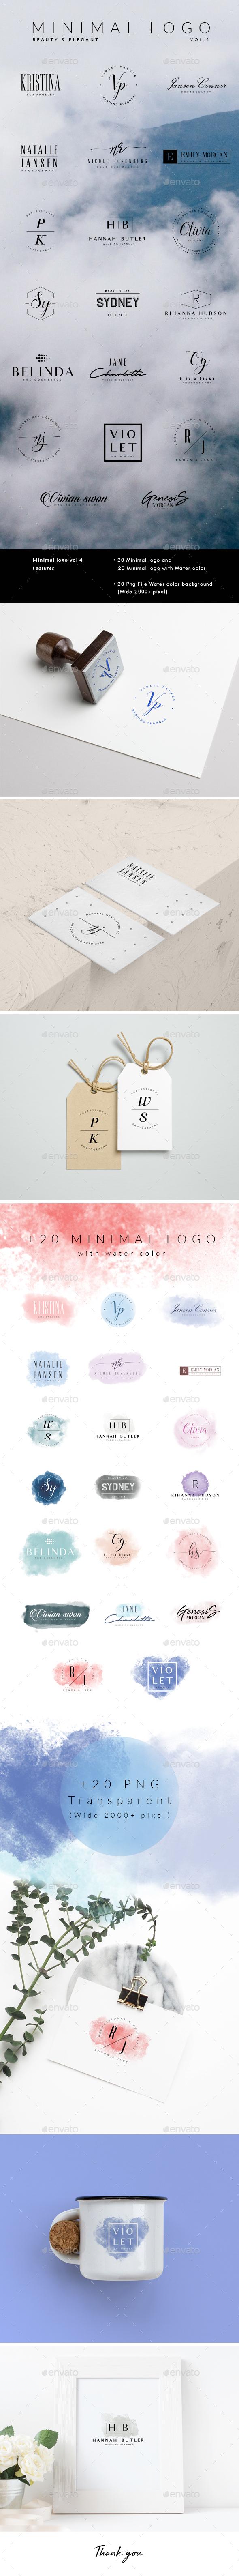 Minimal Logo Vol.4 - Badges & Stickers Web Elements